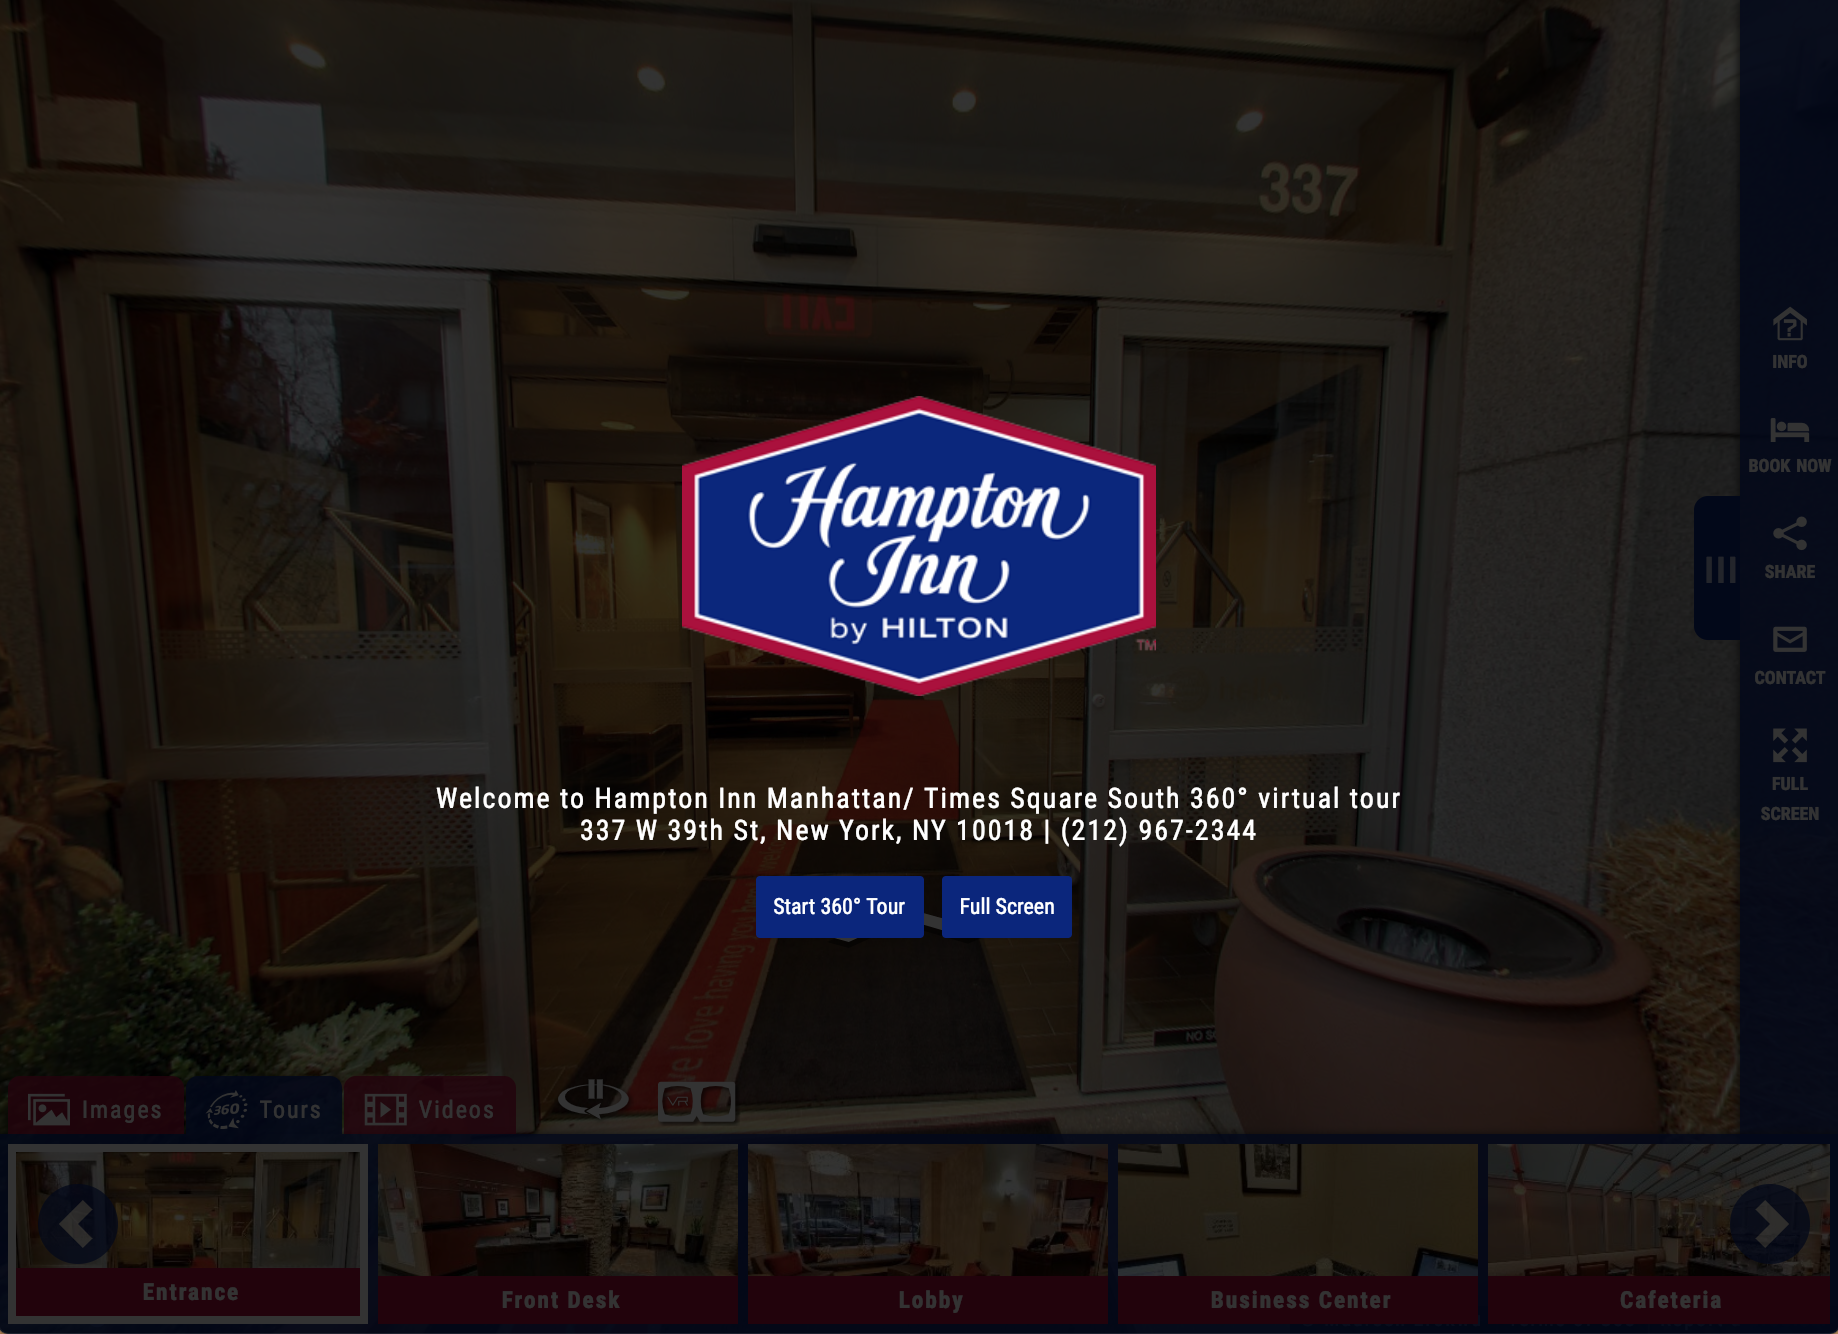 Hamtpon Inn by Hilton - New York.png